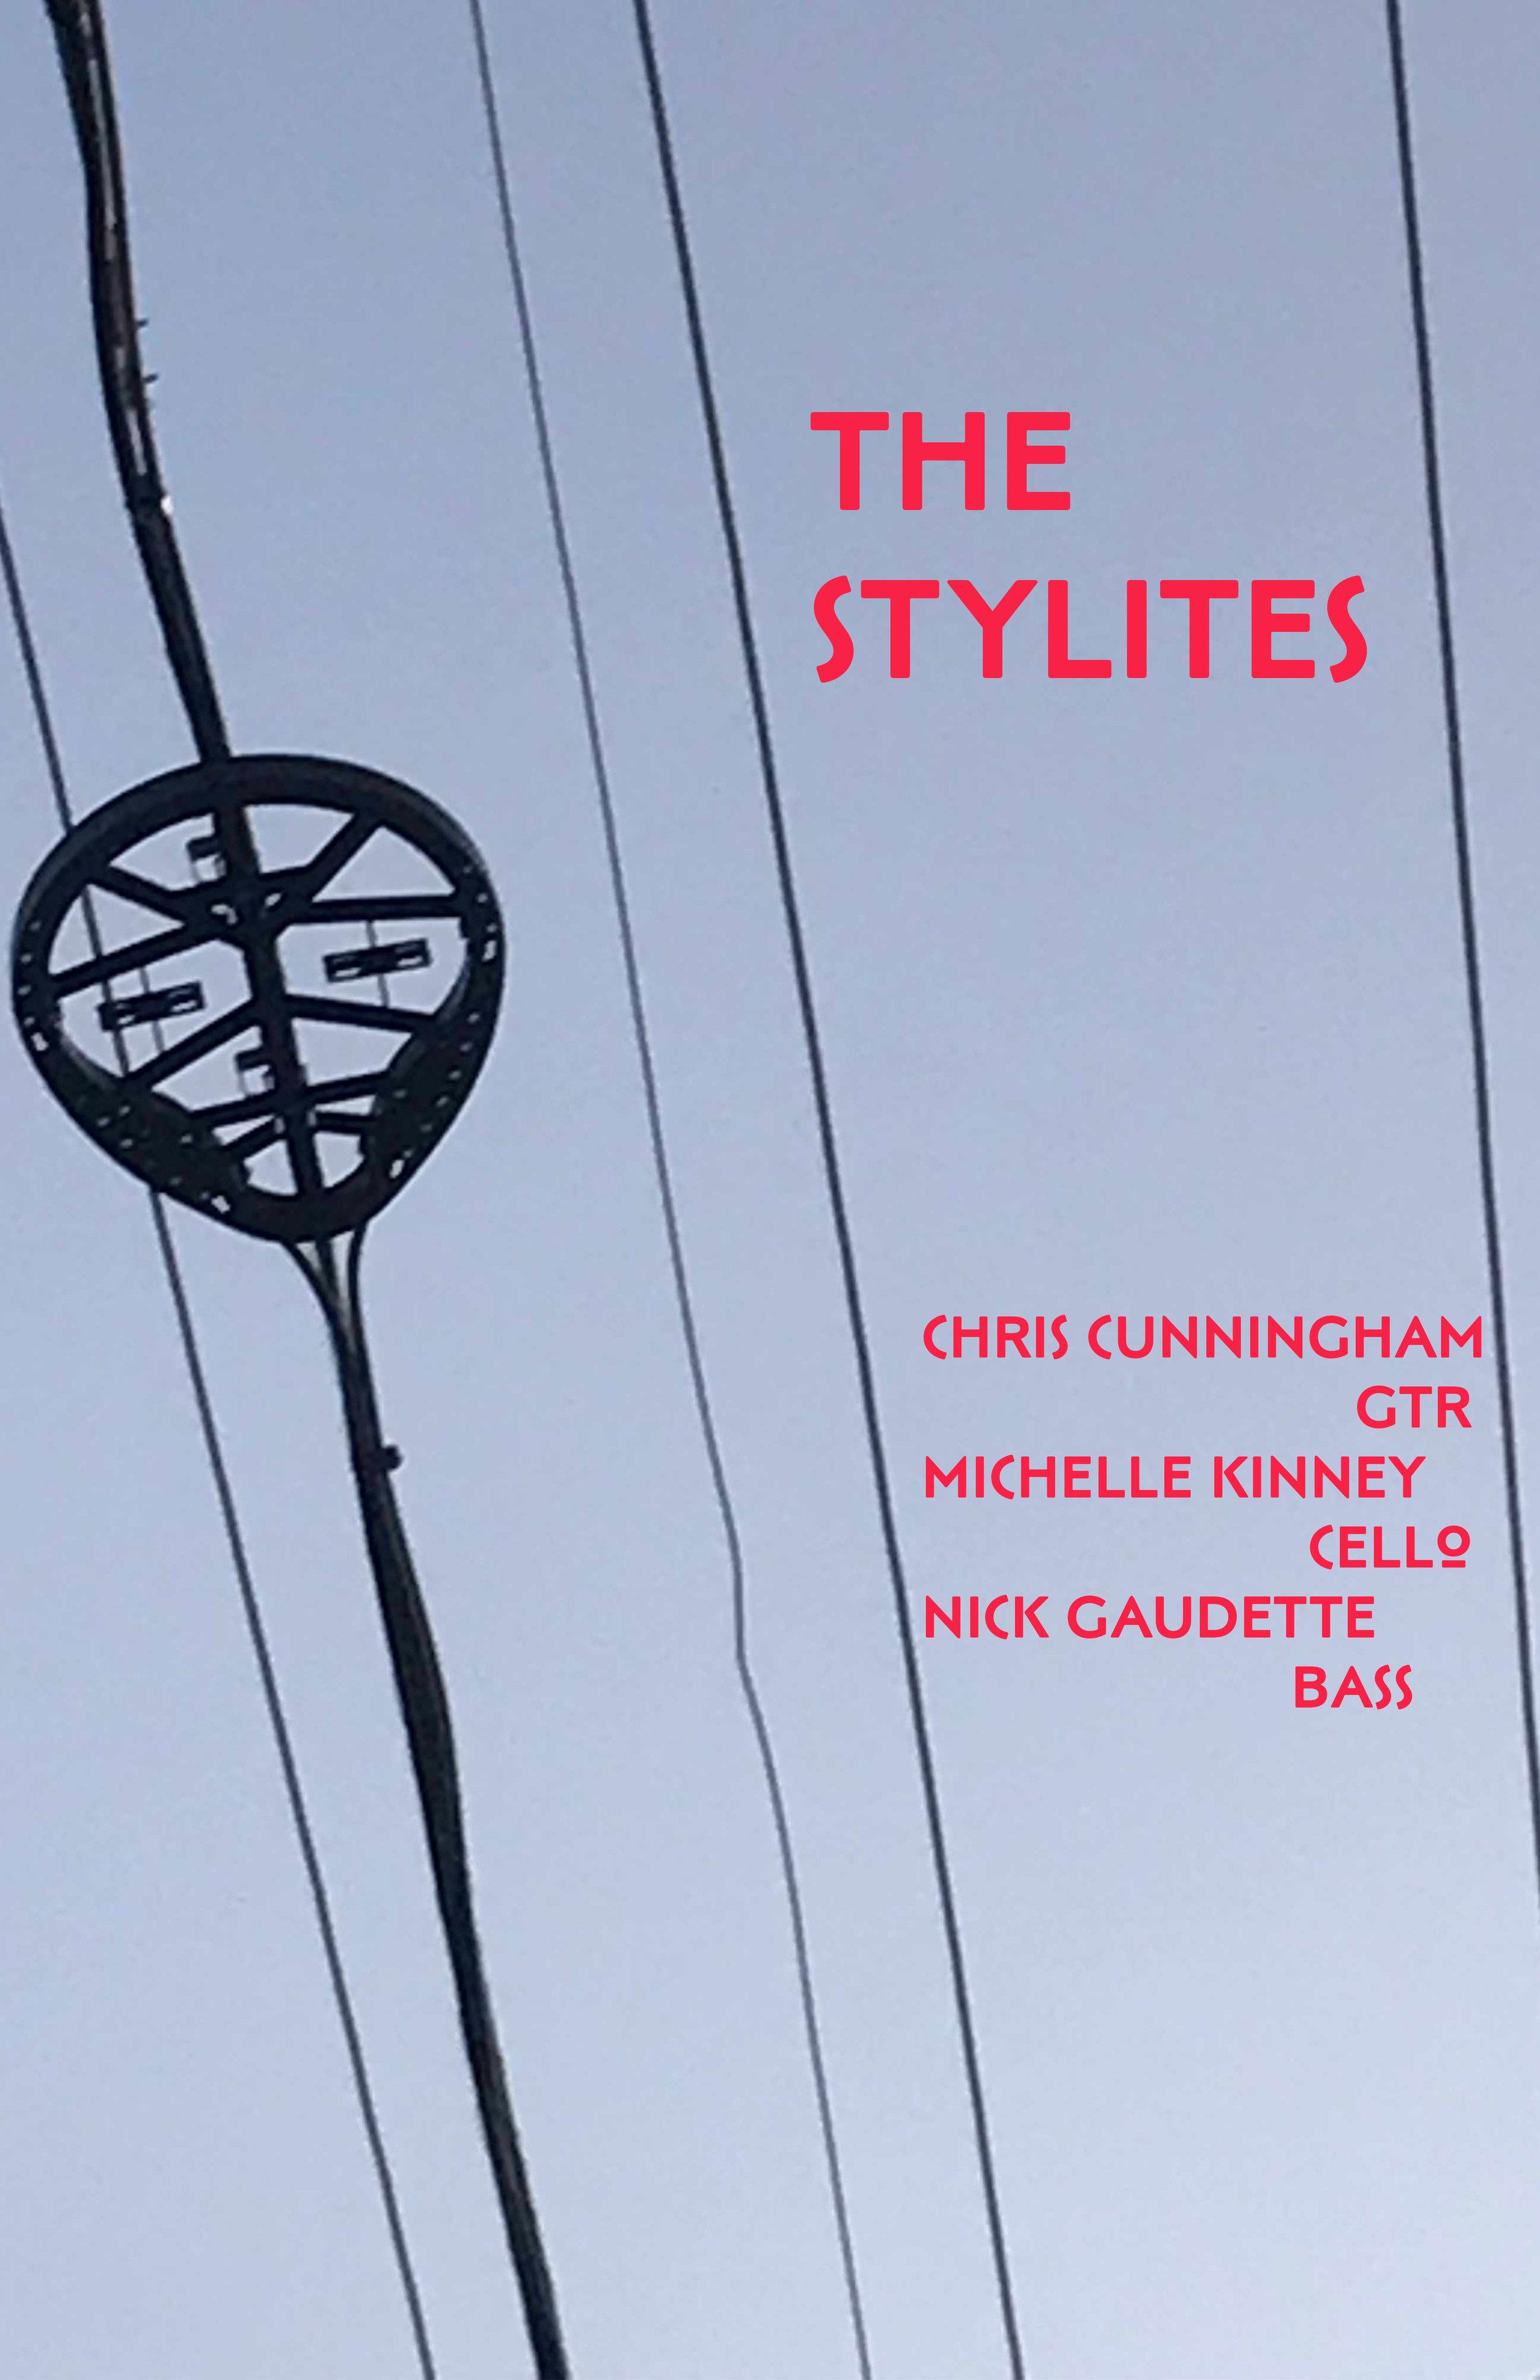 The Stylites 1.1.jpg